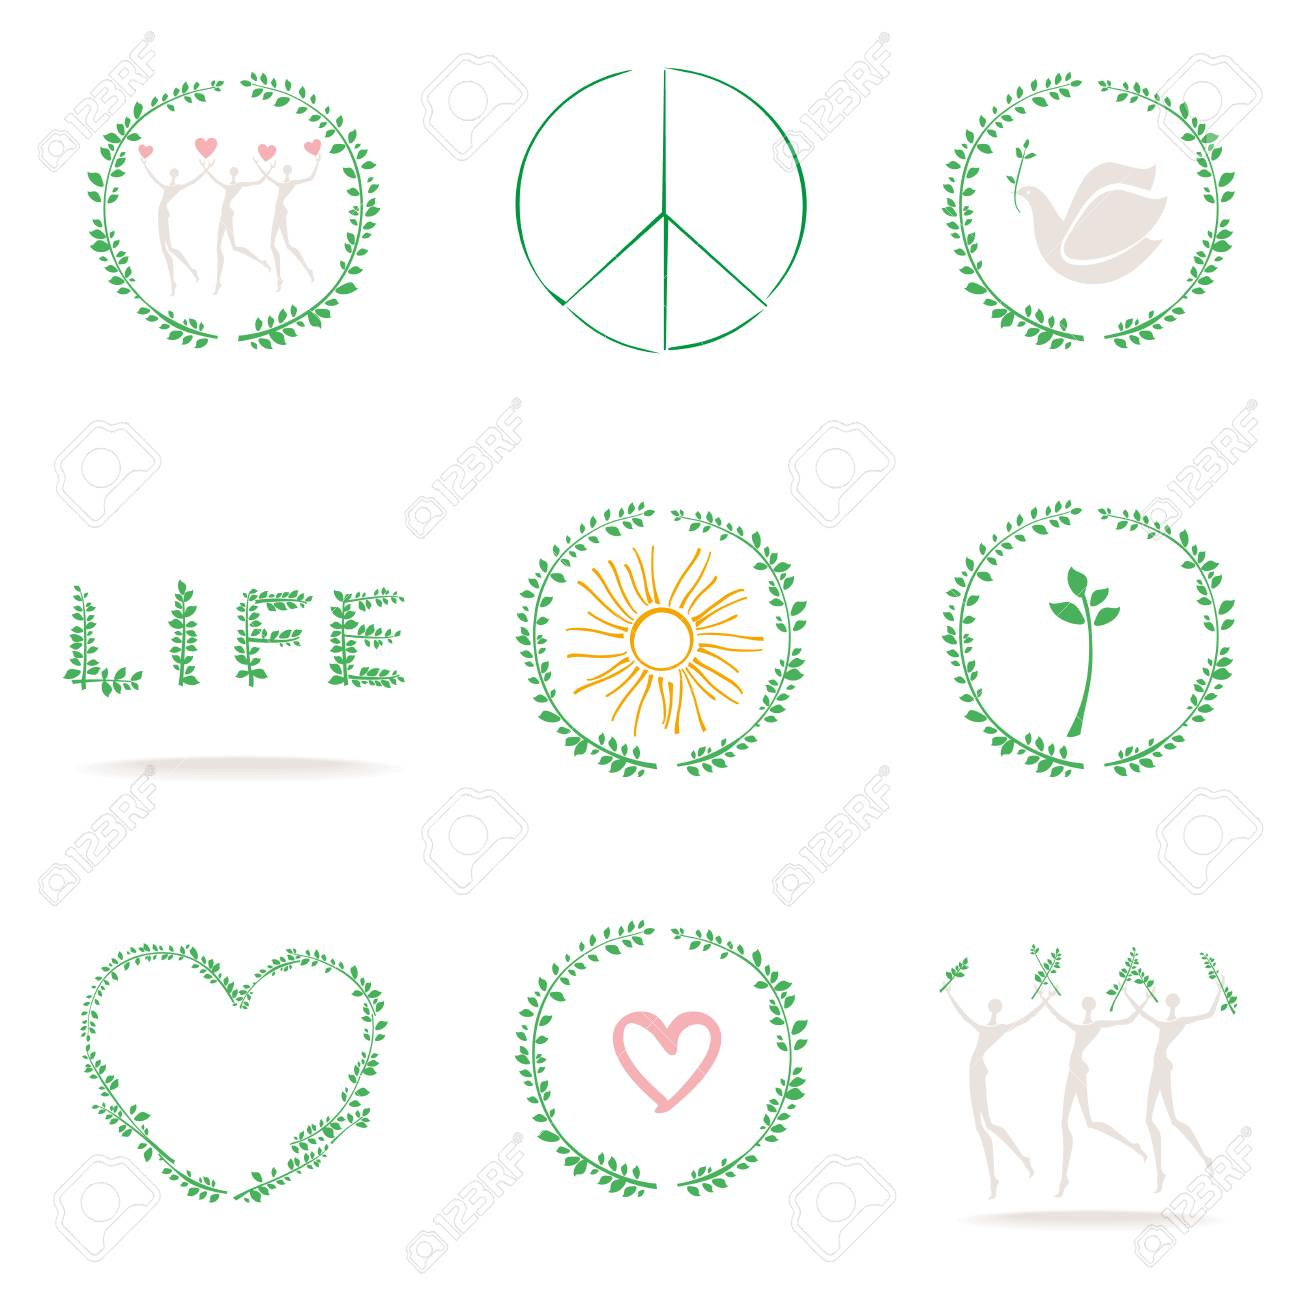 Set Of Conceptual Icons Symbols Of Life Nature Peace Love